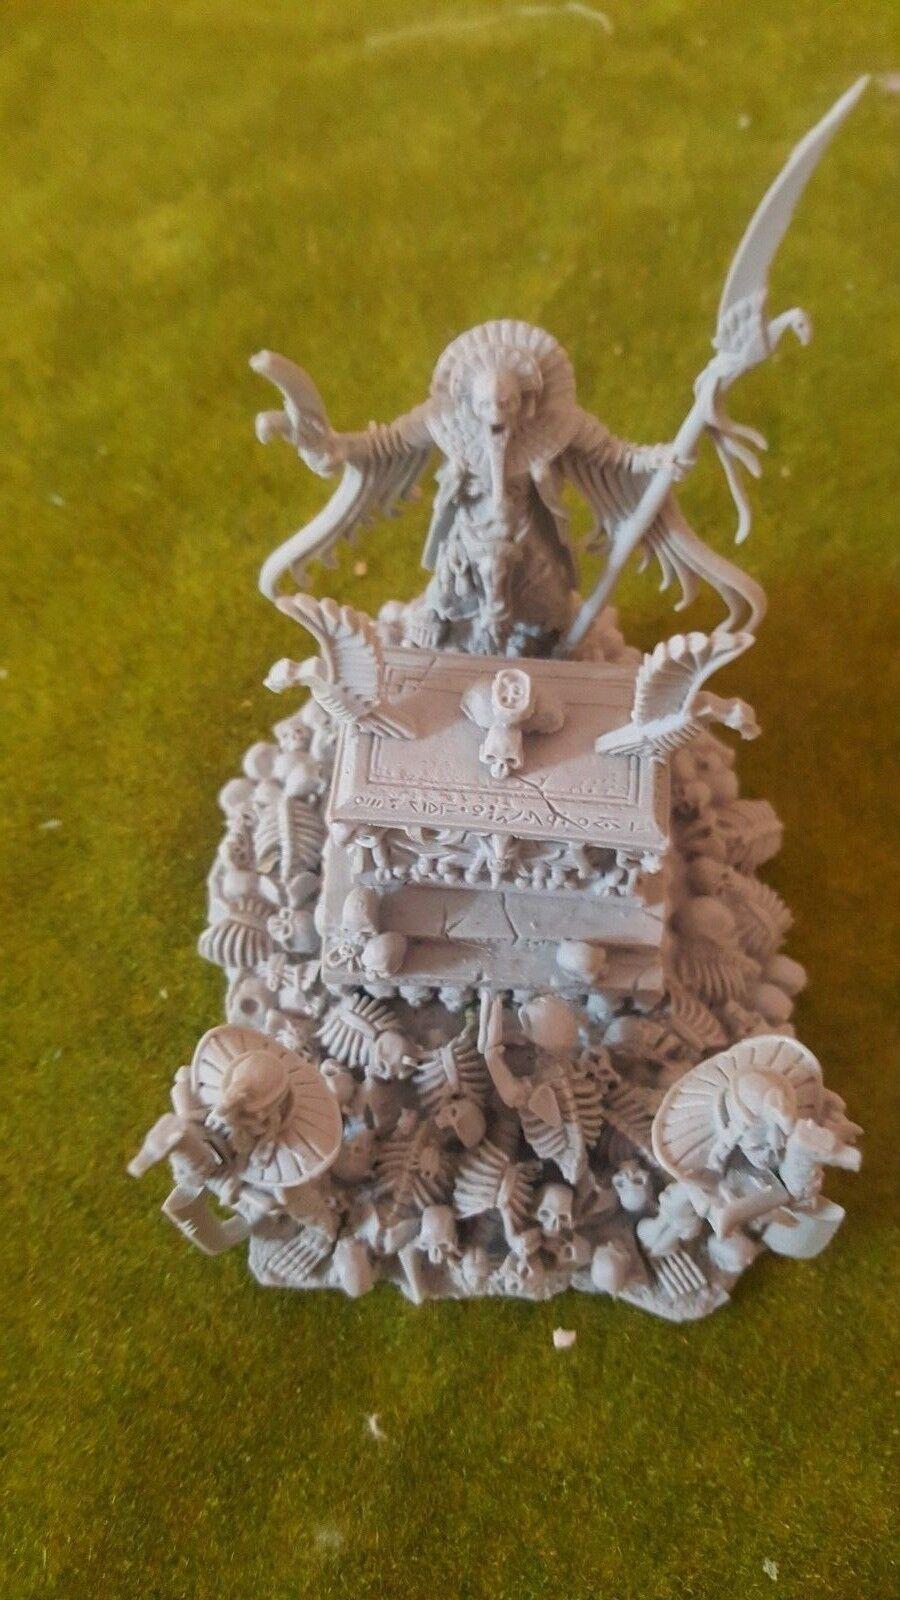 Warhammer Khemri Casket of Souls Citadel Warhammer Tomb Kings AOS Gamesworkshop